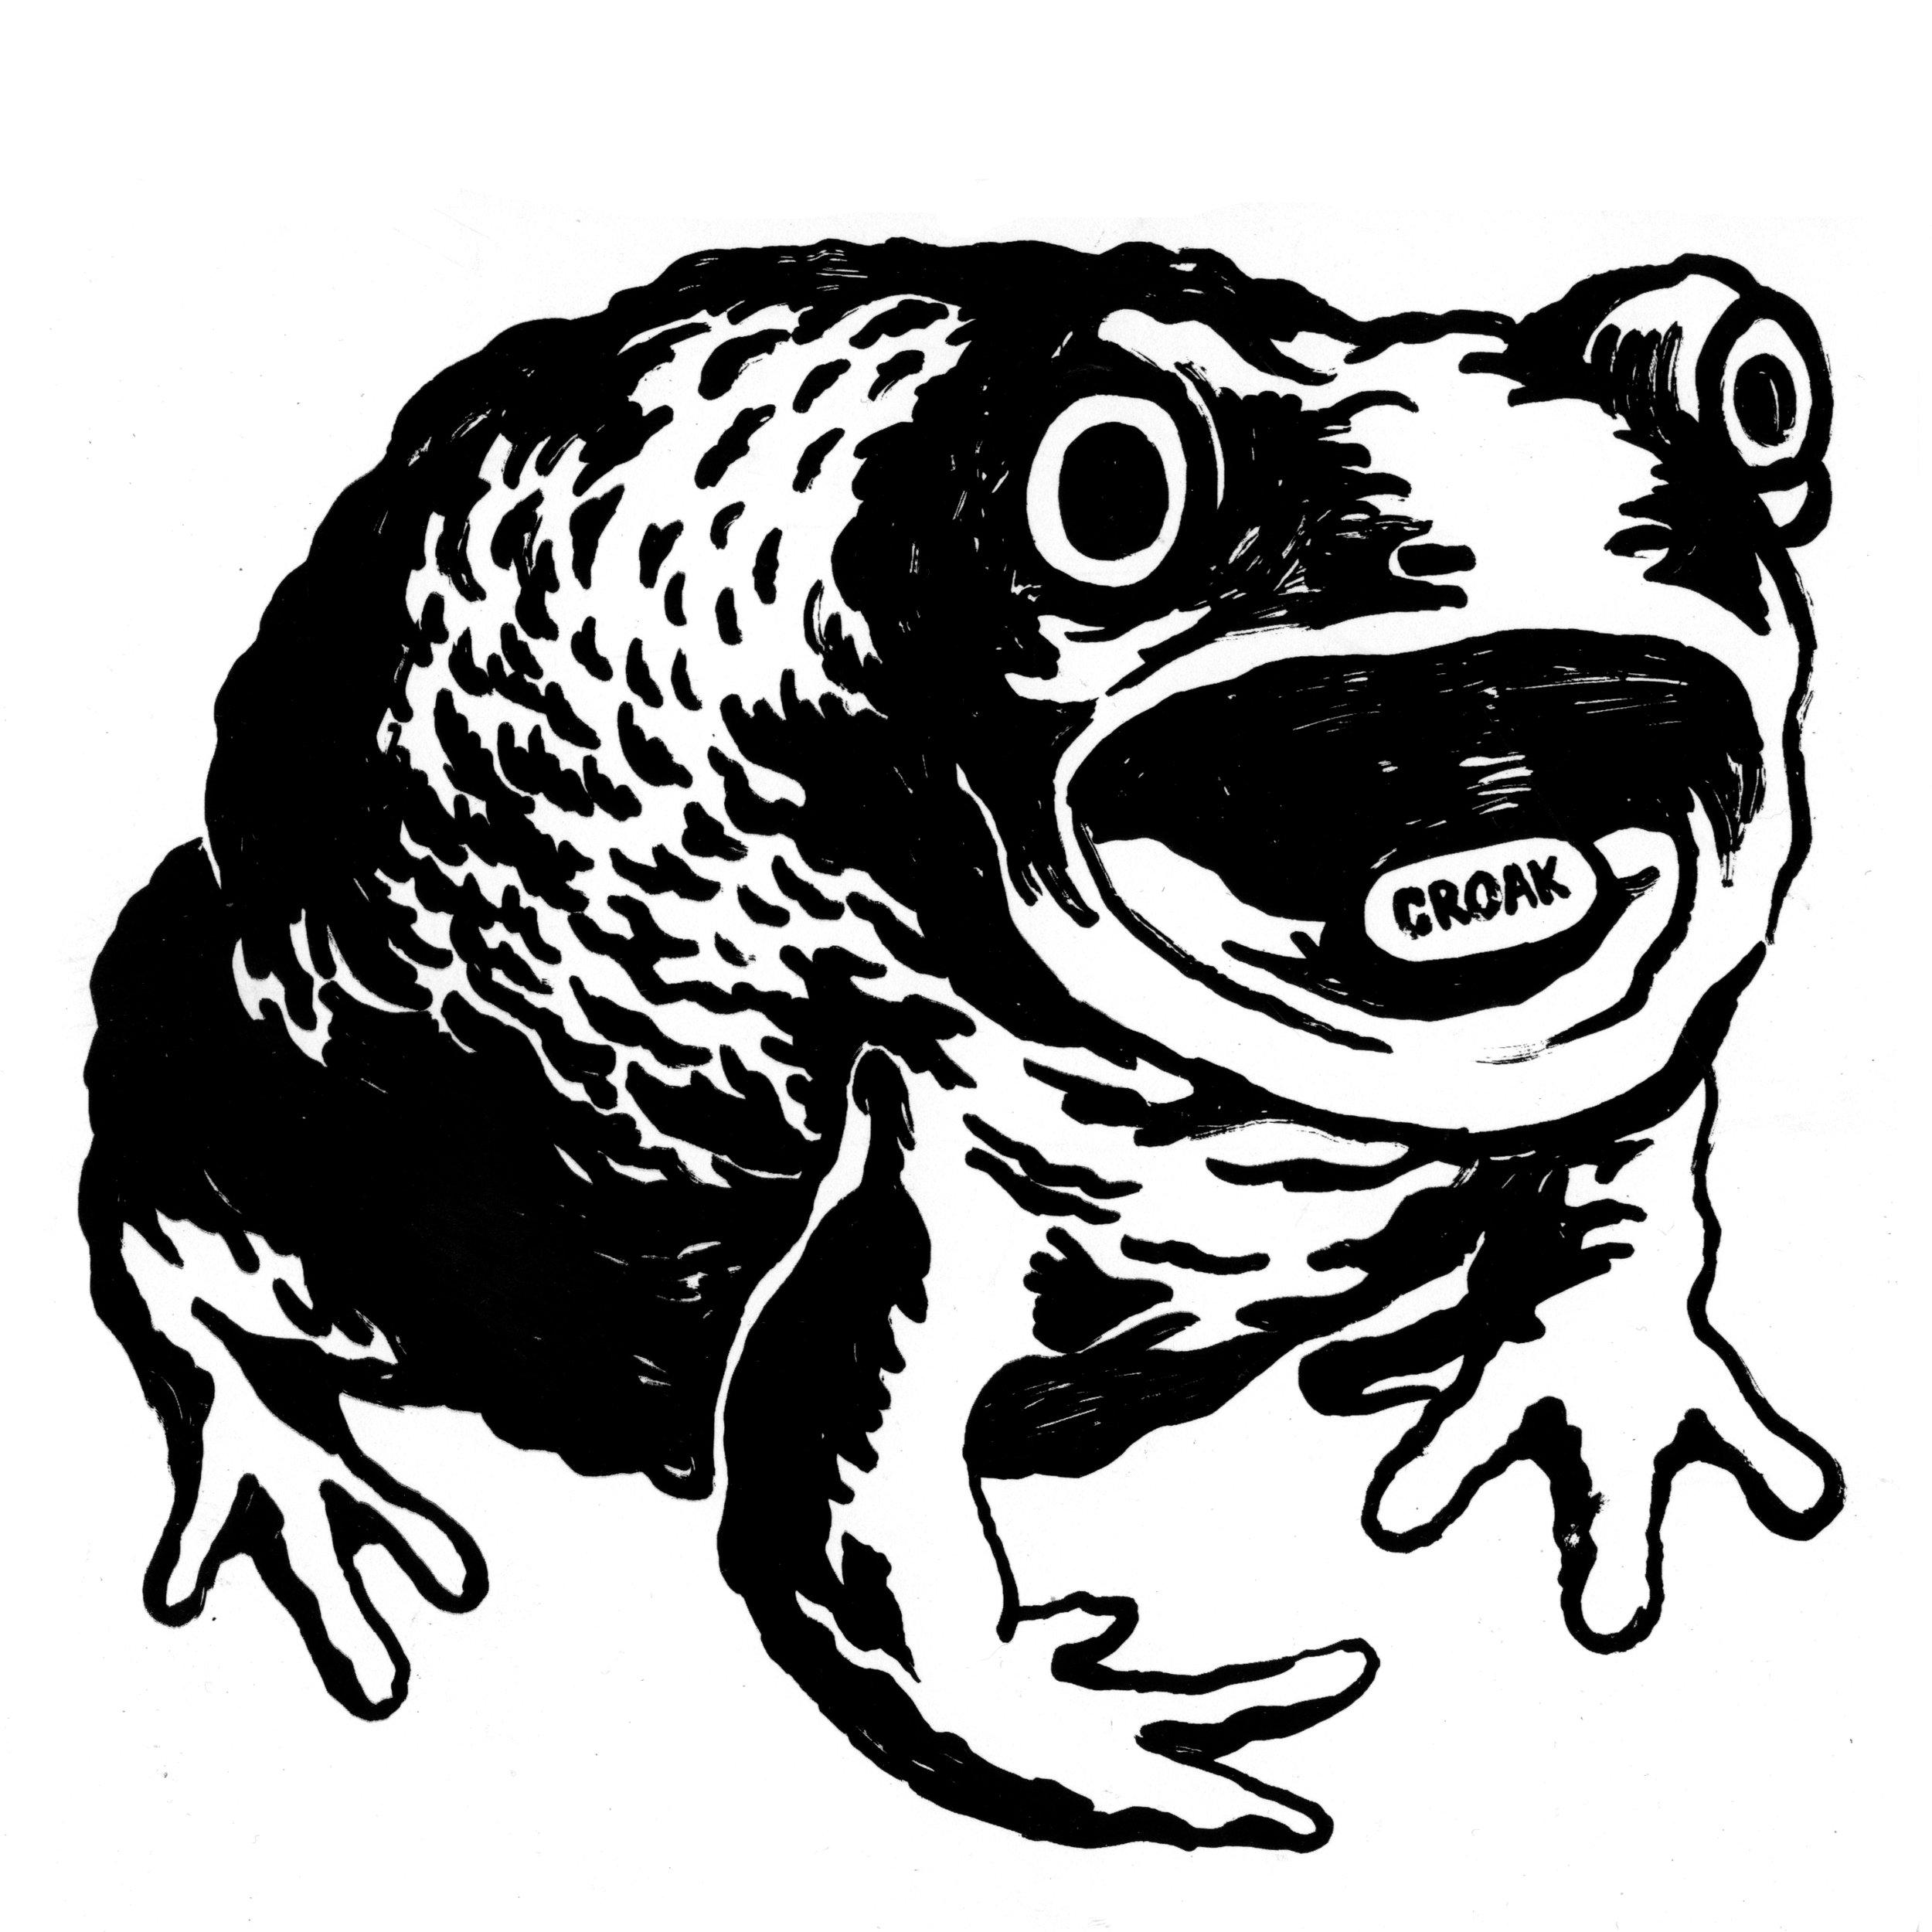 Croak Toad  2014 screenprint